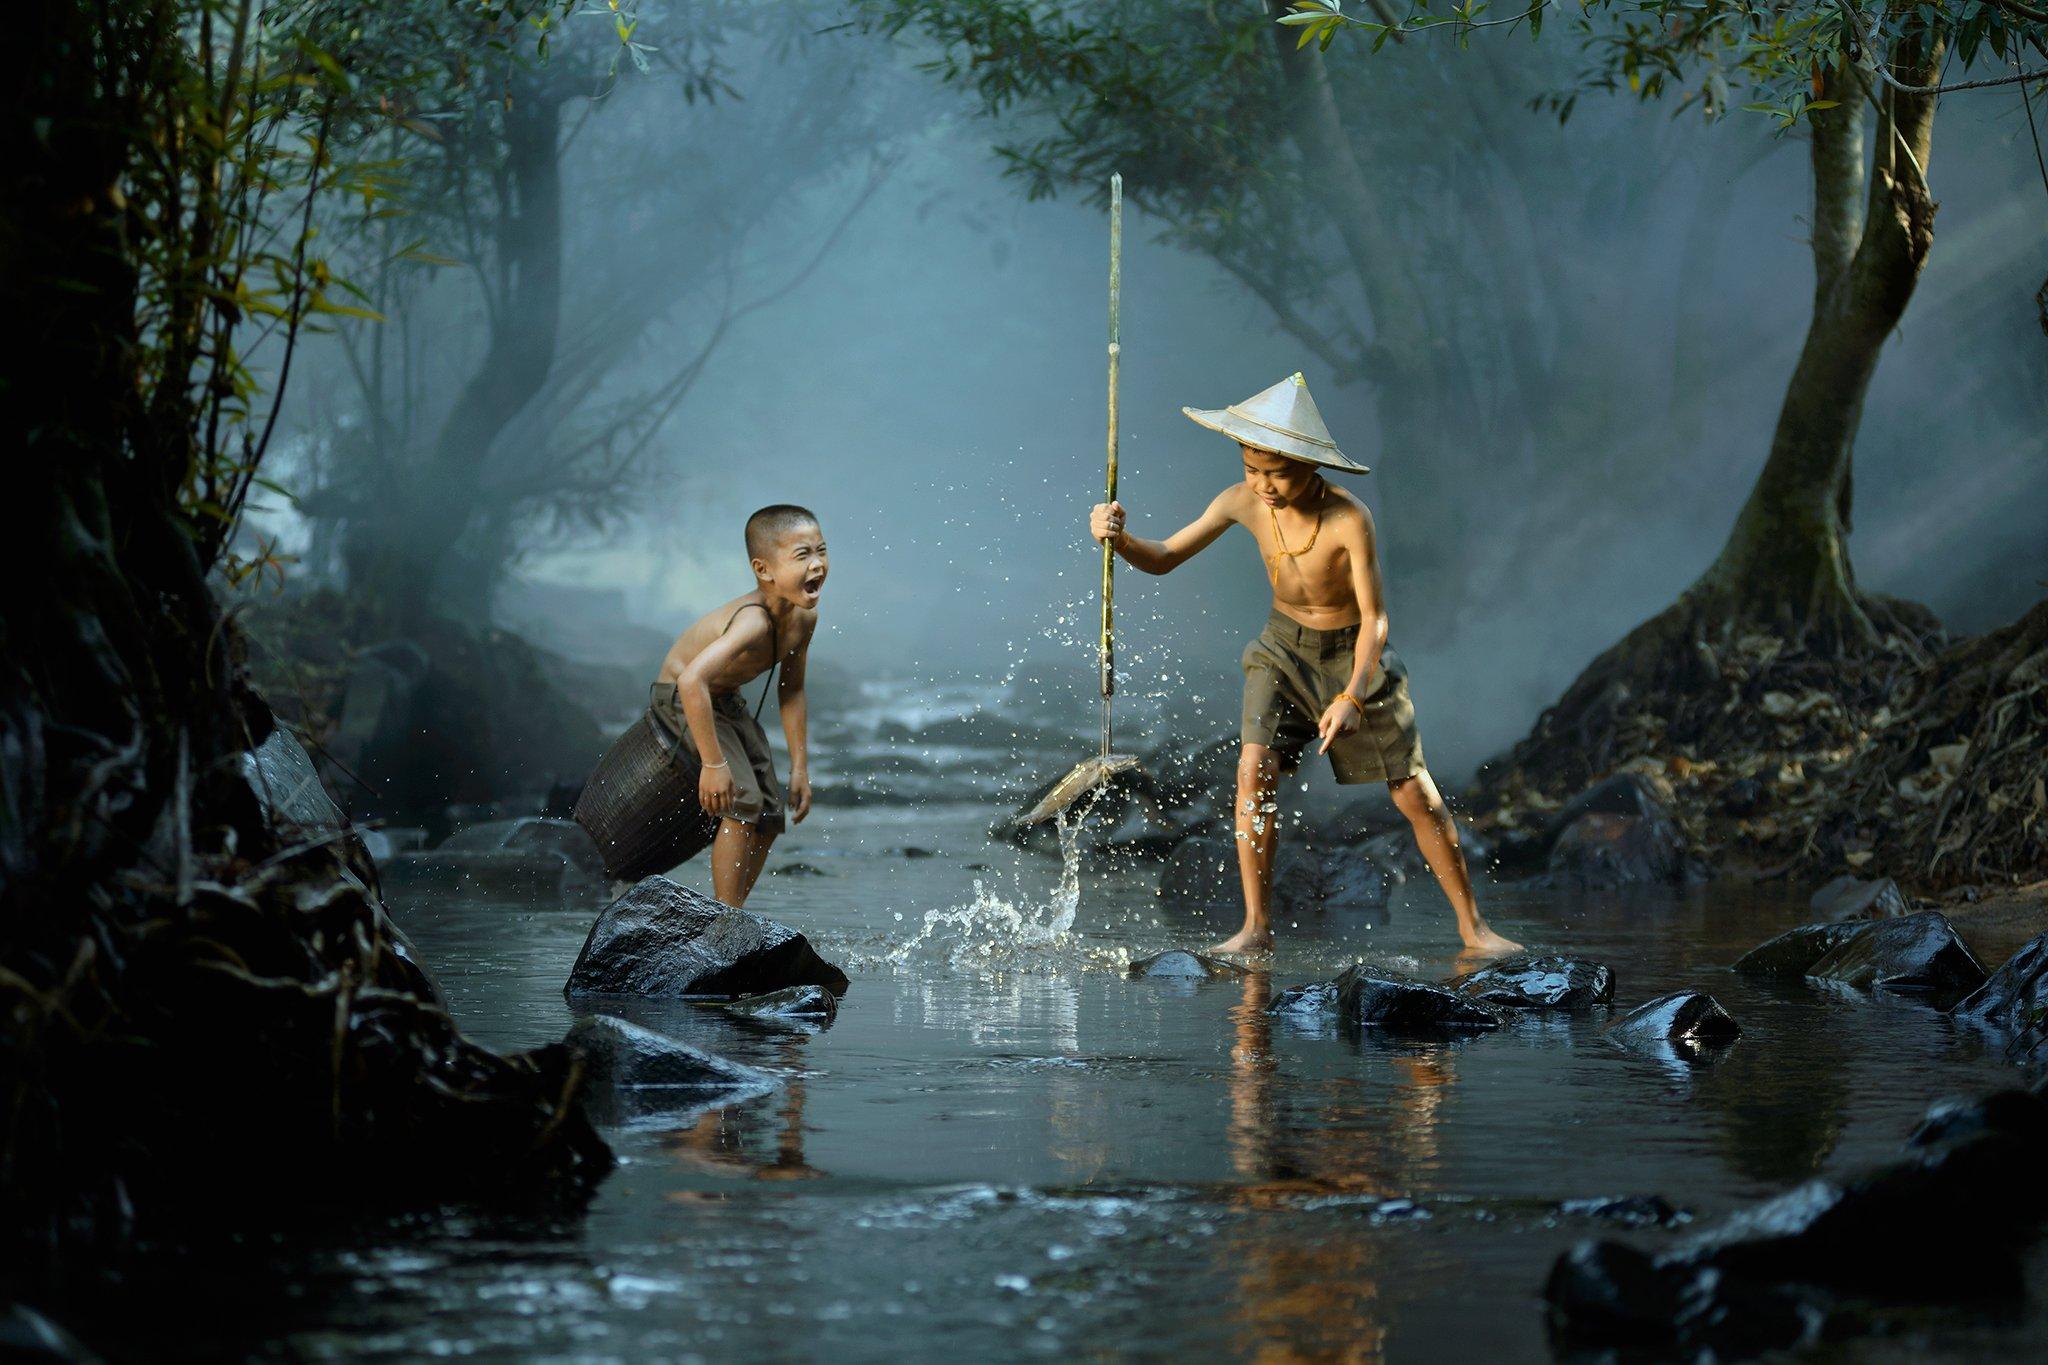 Action, Asia, Asian, Child, Children, Fisherman, Fishing, Happiness, Light, River, Saravut Whanset